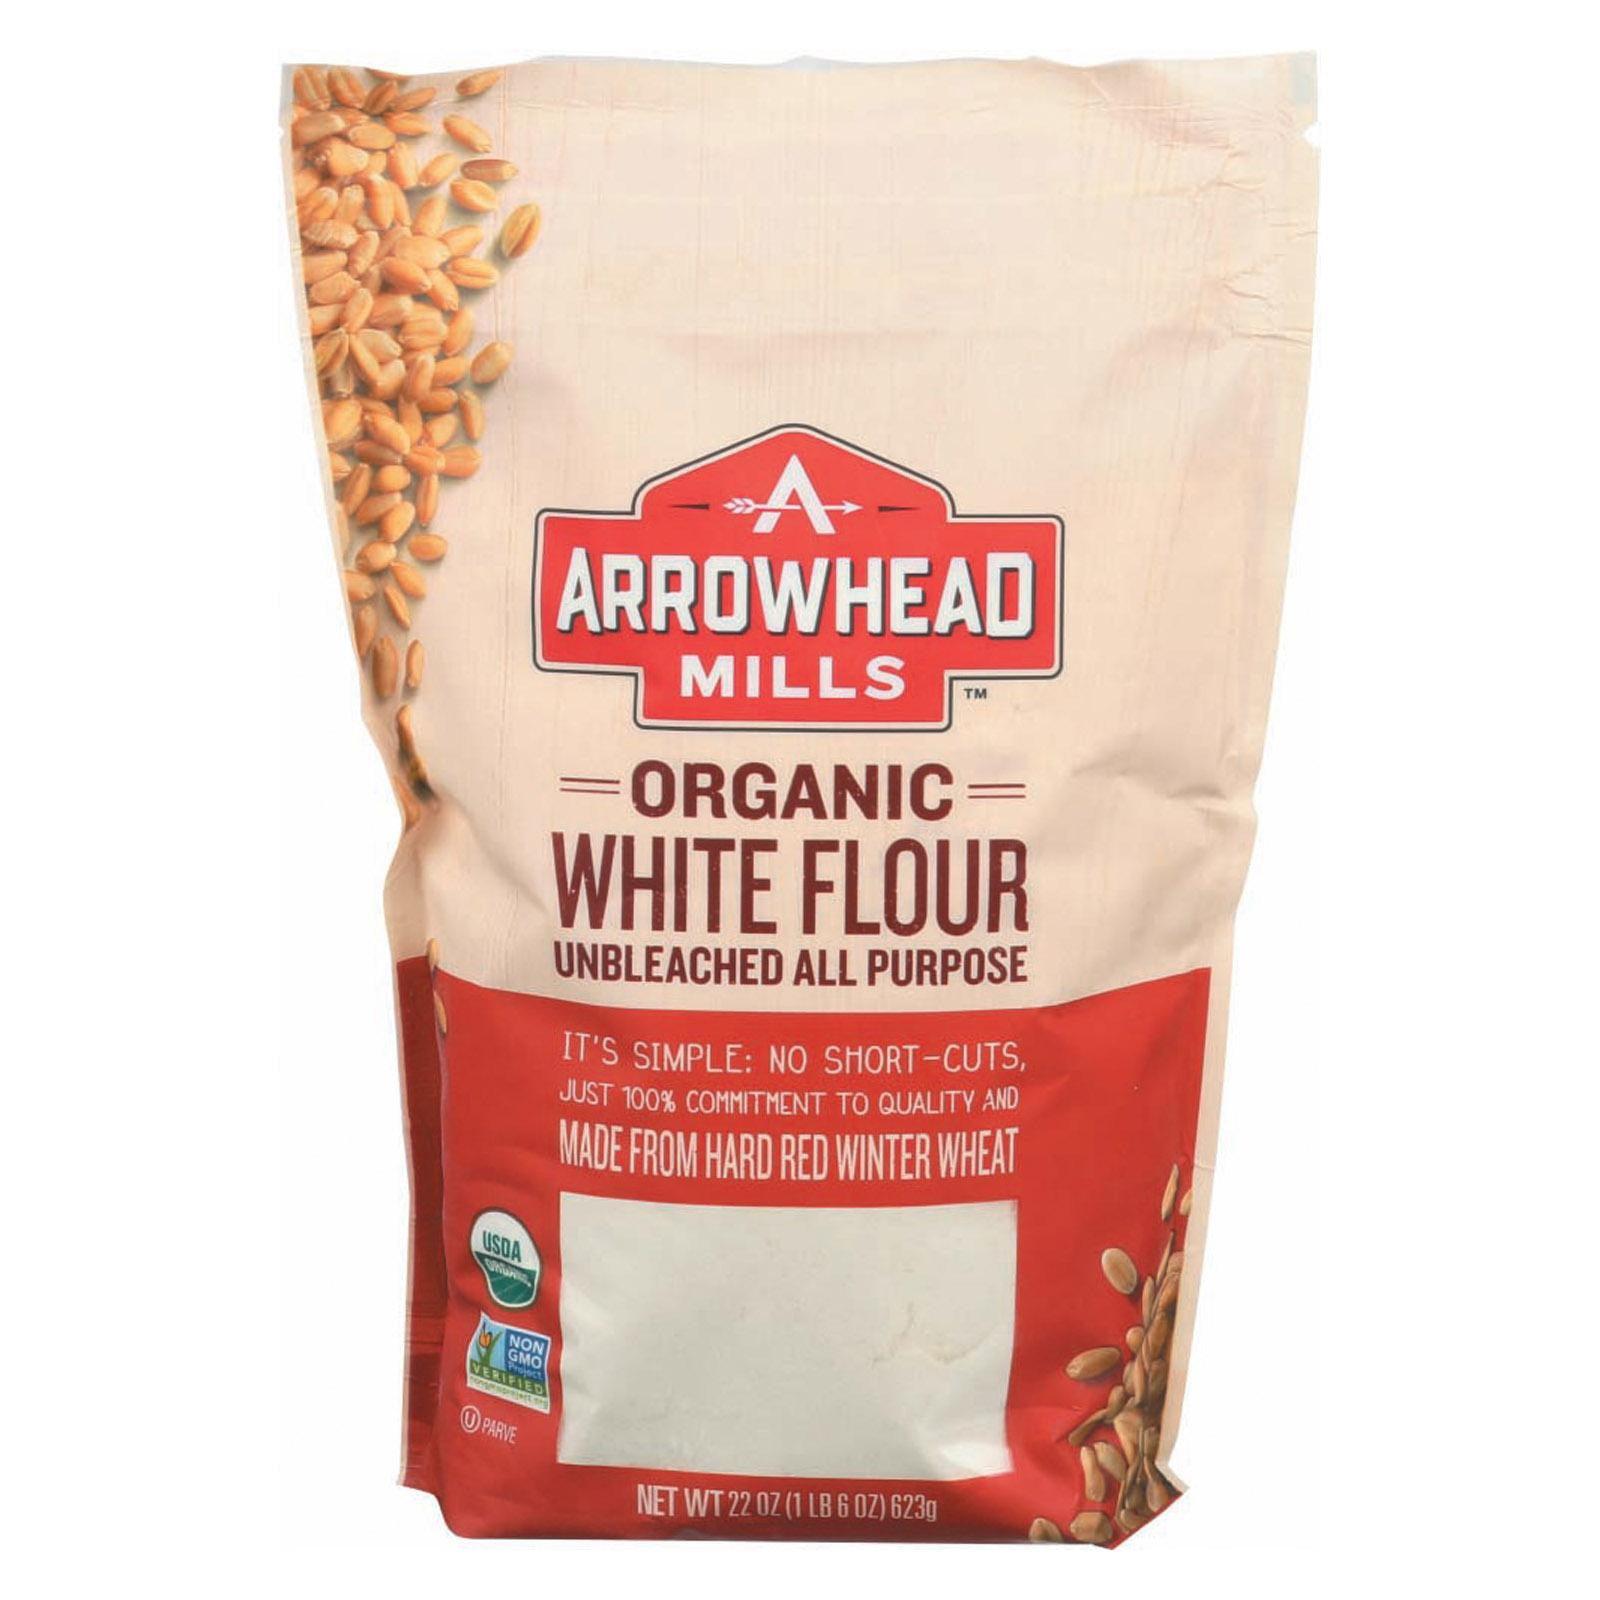 Arrowhead Mills Organic Enriched Unbleached White Flour - pack of 6 - 22 Oz.